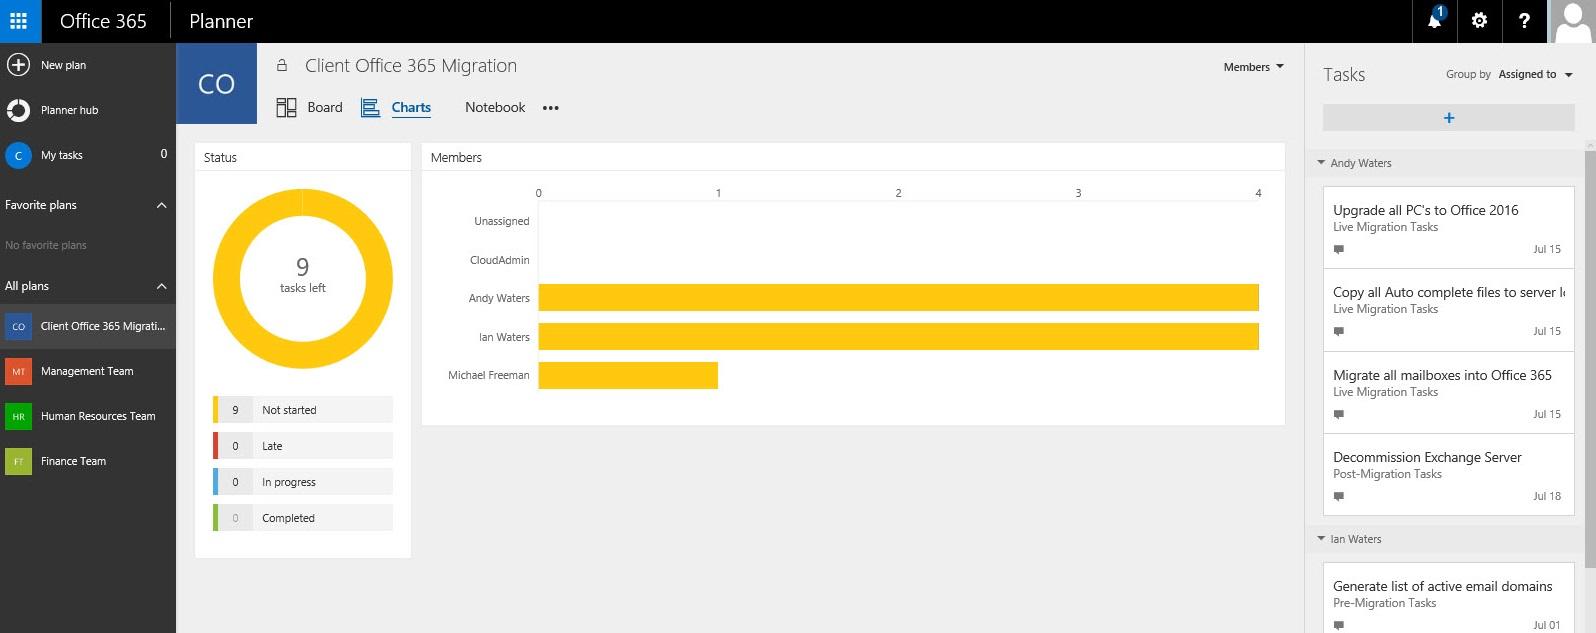 Office 365 Planner 9